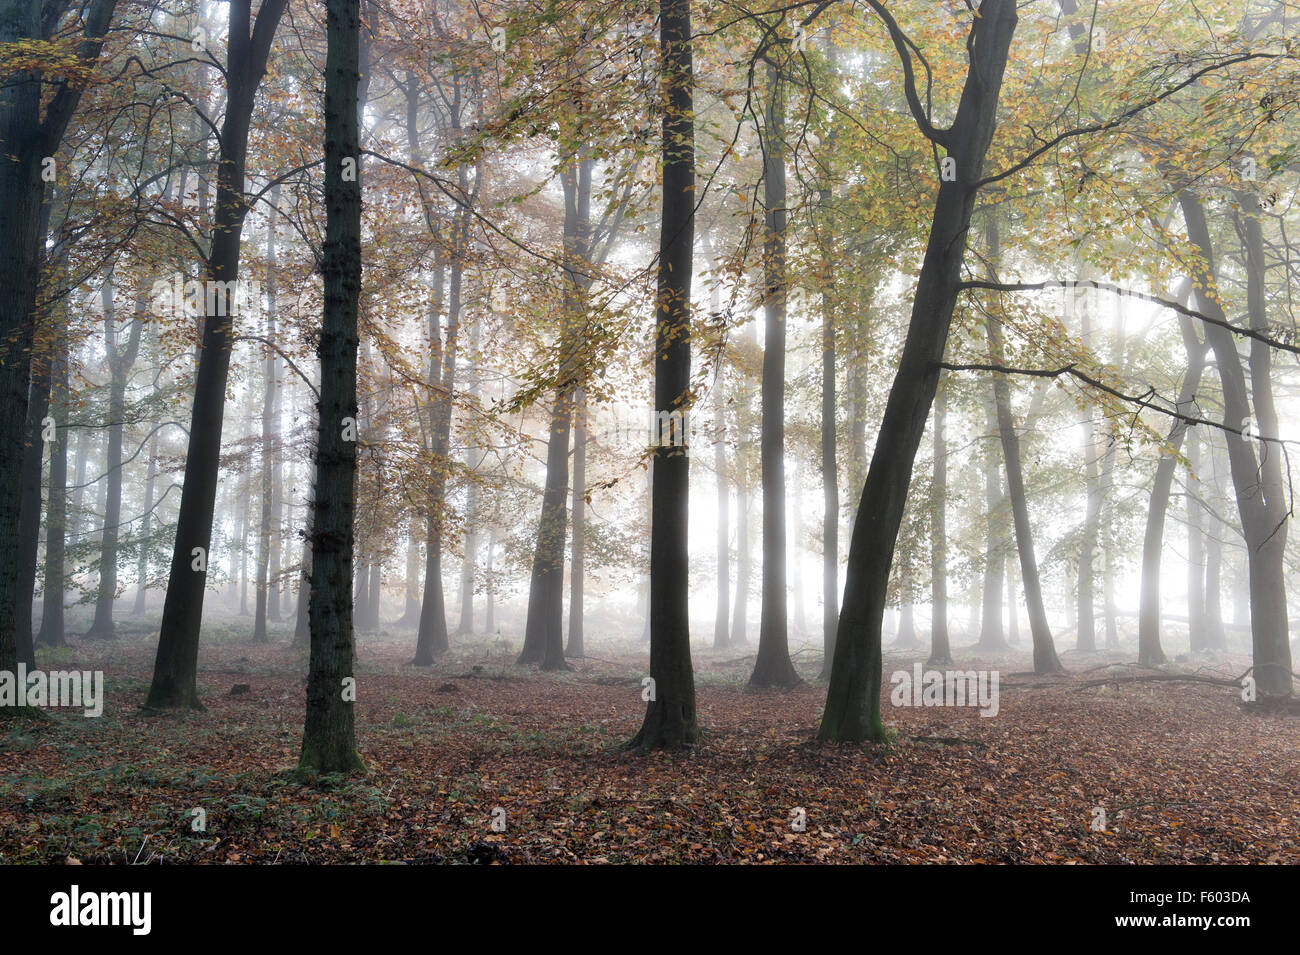 Fagus sylvatica. Beech tree woodland and autumn mist. UK - Stock Image